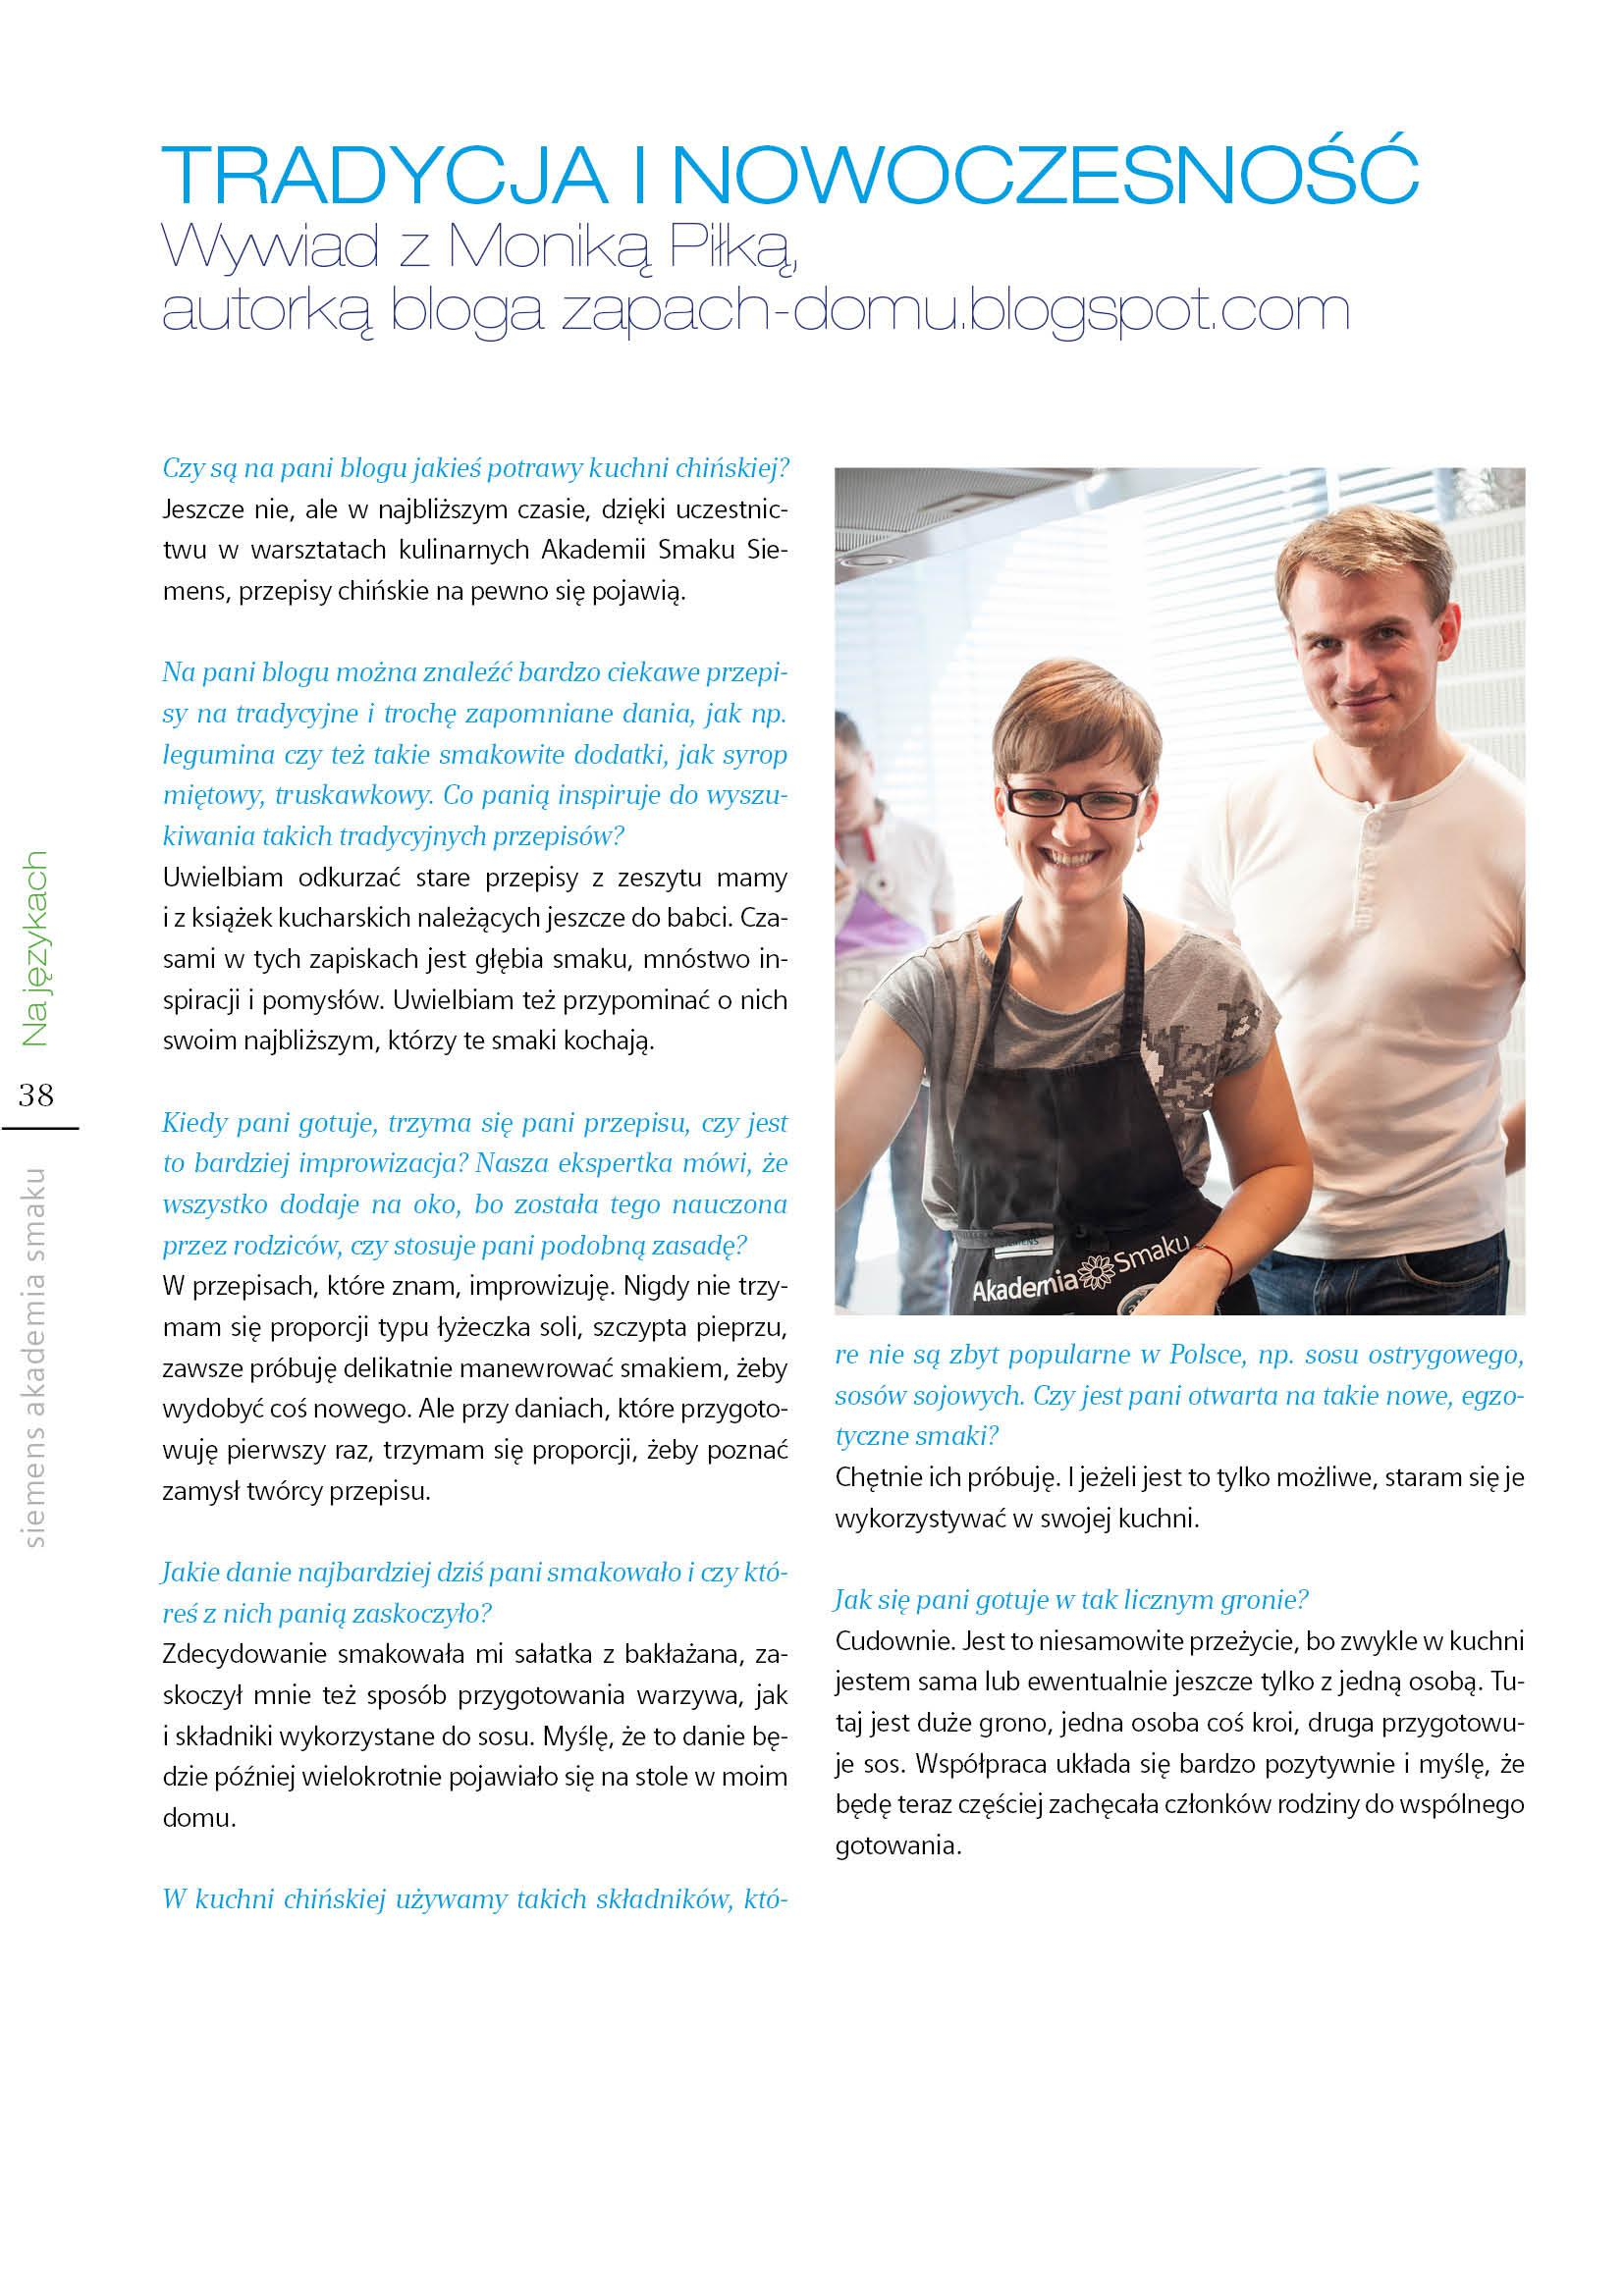 Kuchnia chińska - Strona 38